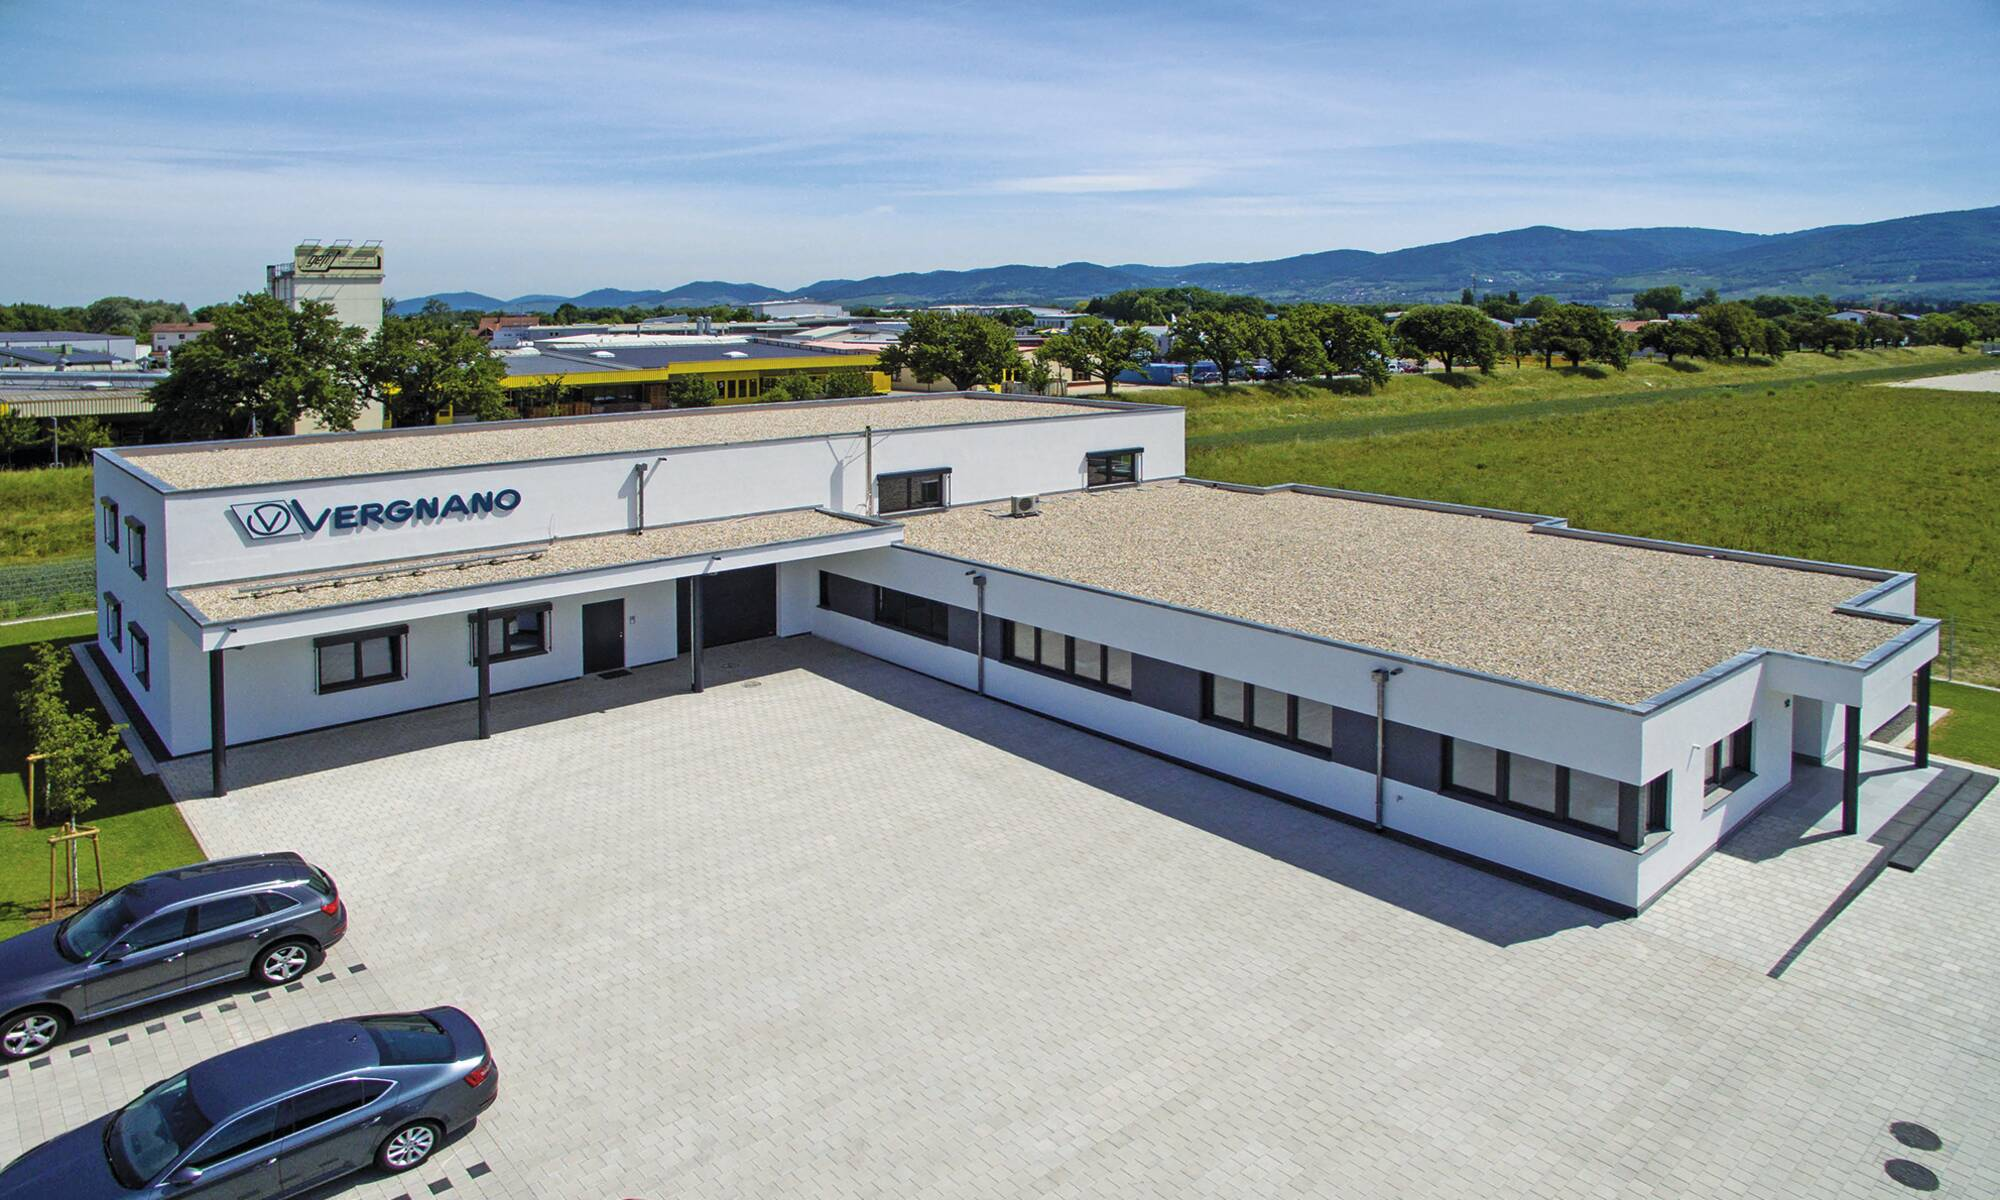 Objektbau Luftaufnahme Firma Vergnano